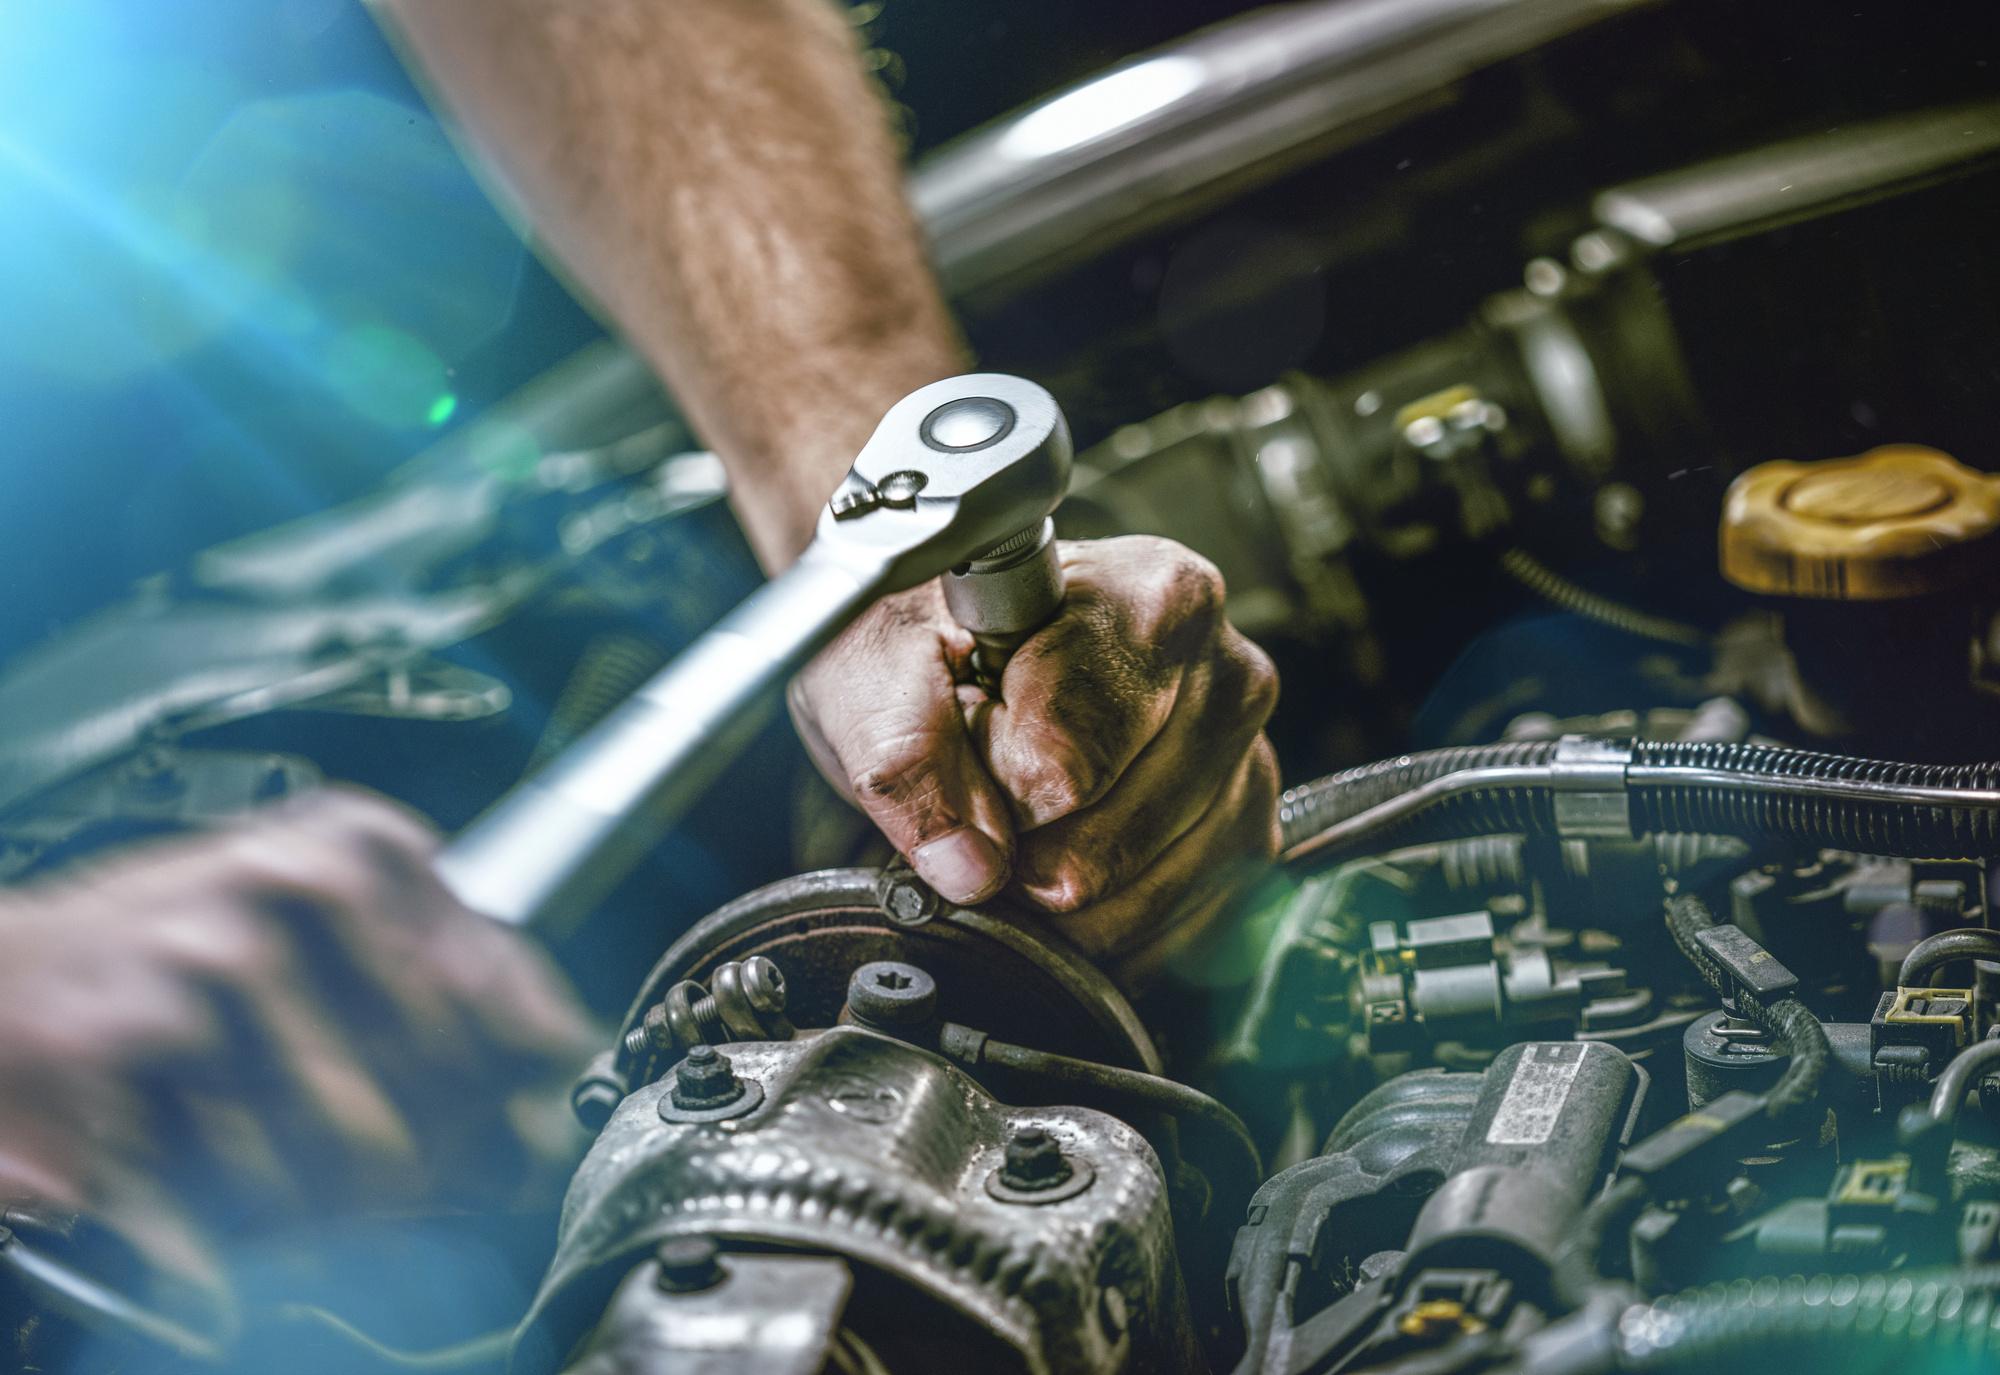 5 Expensive Car Repairs That Aren't Worth Fixing